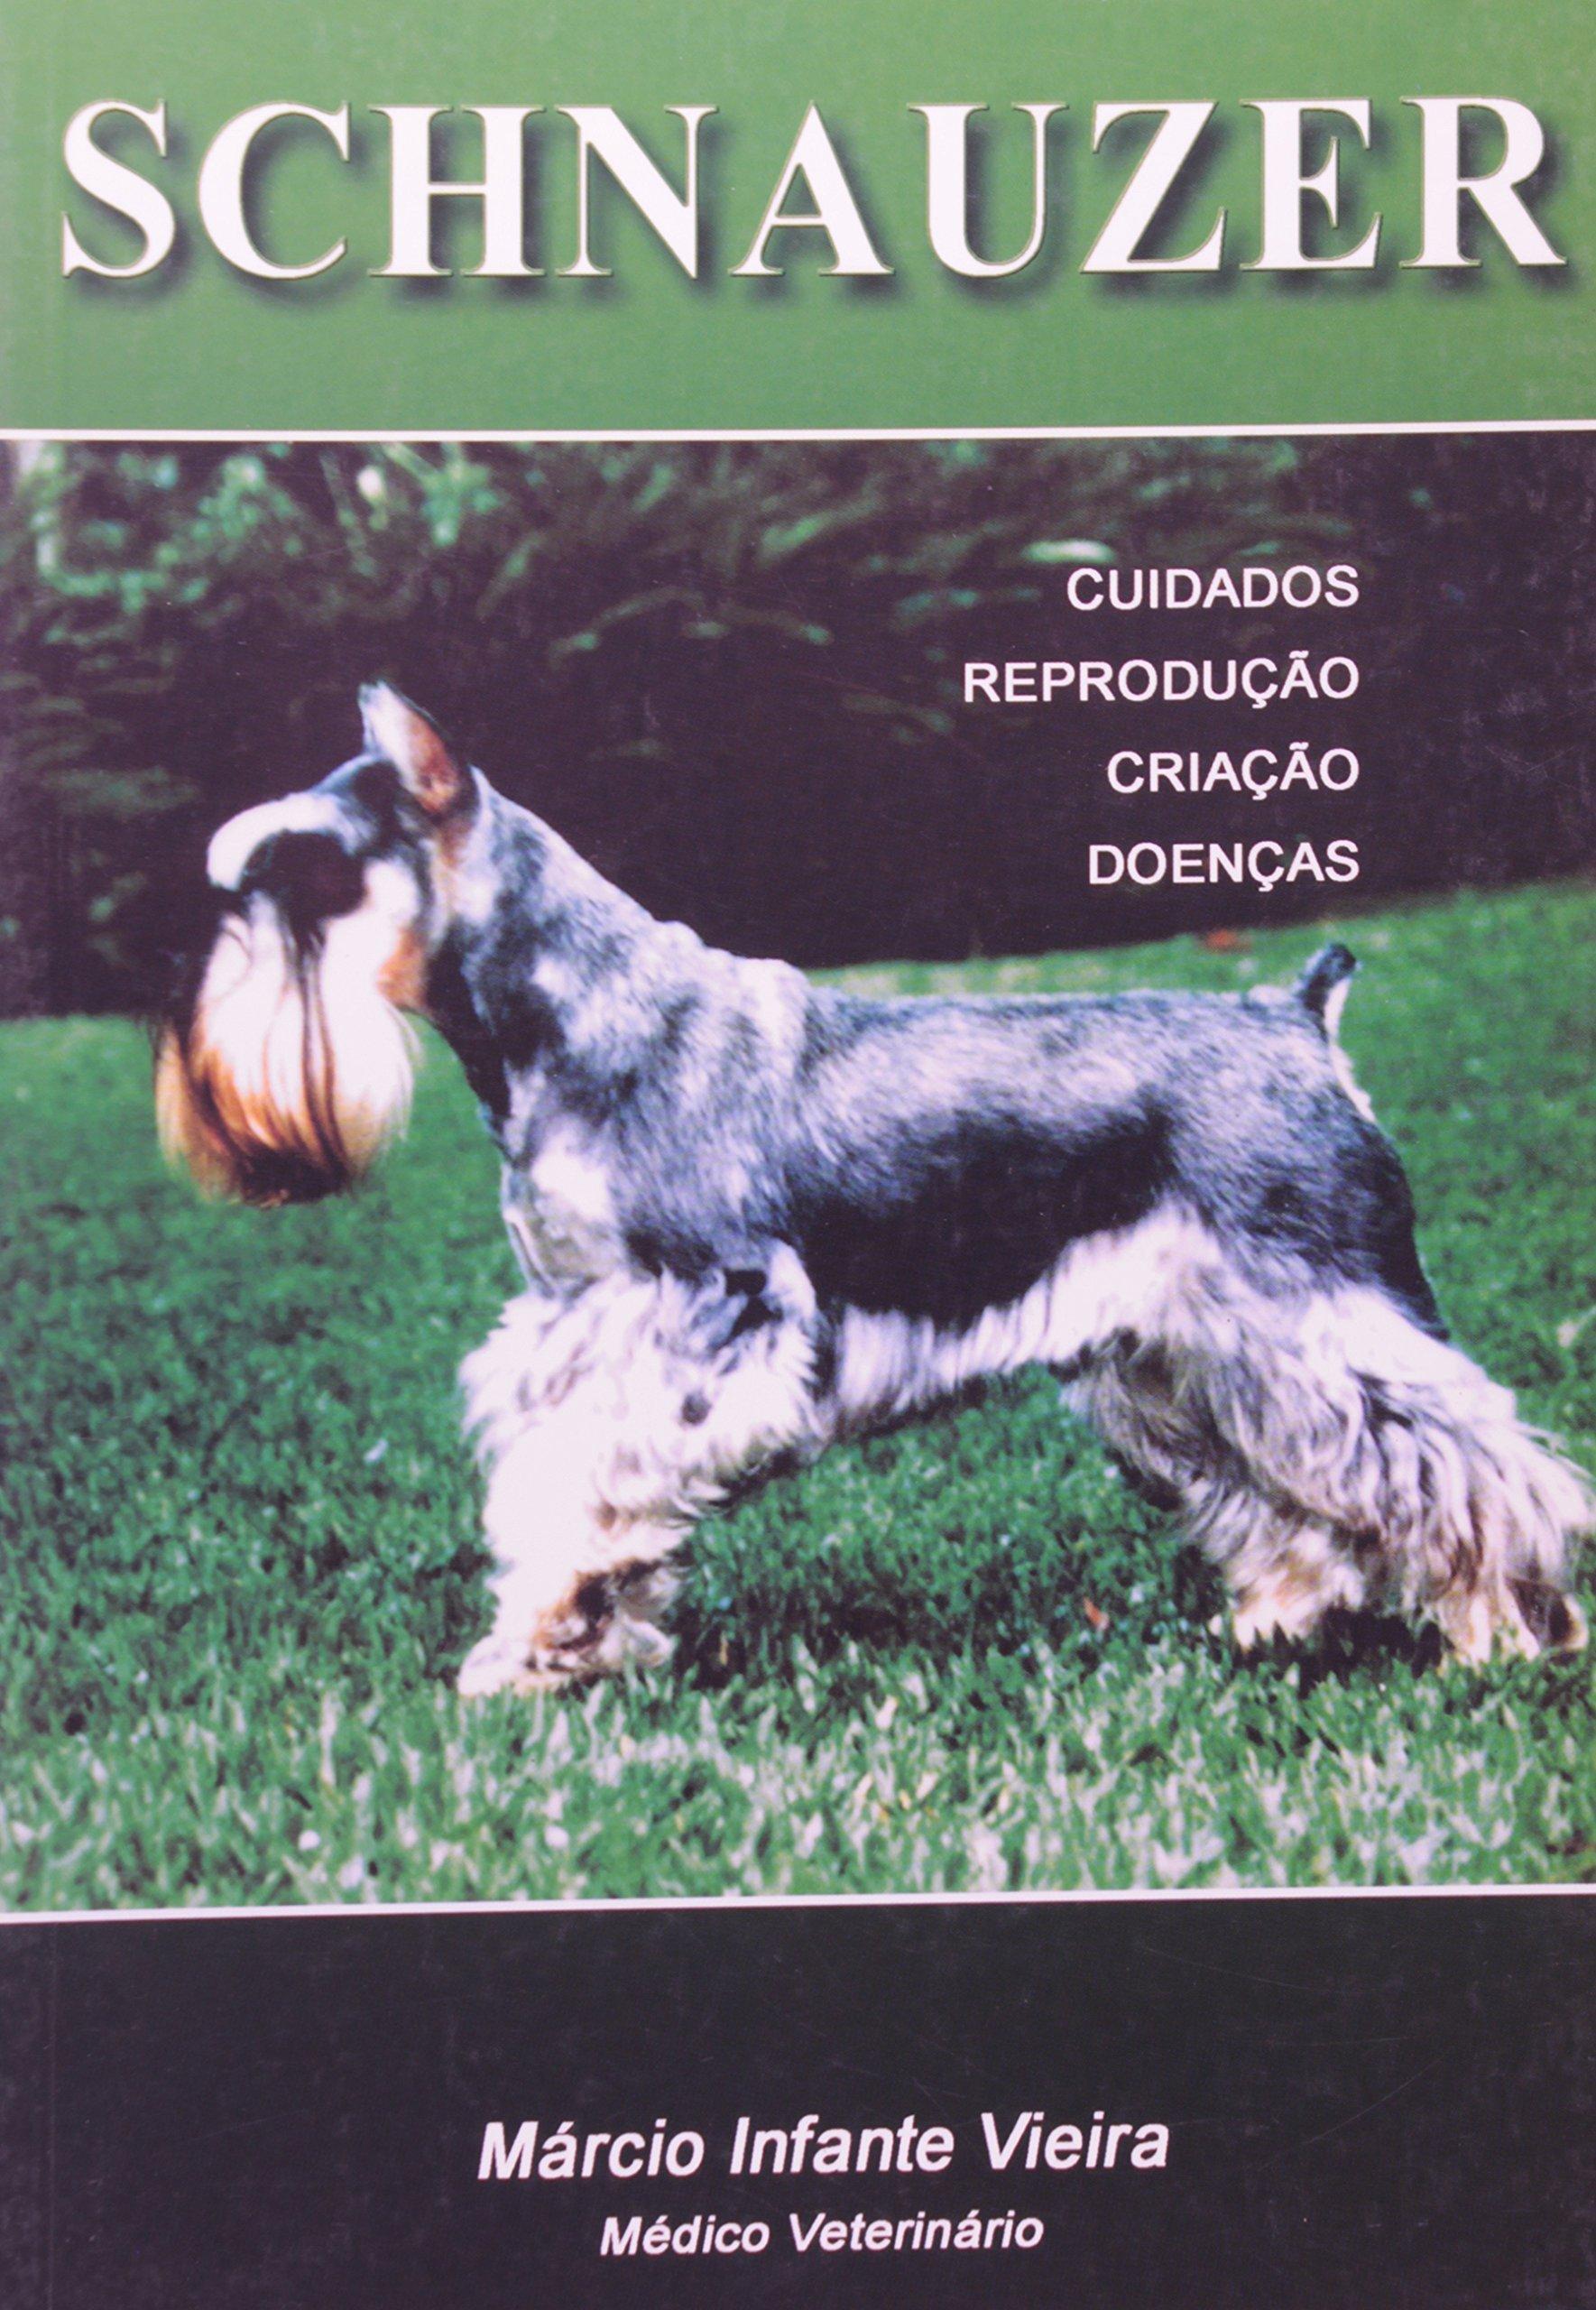 Schnauzer (Em Portuguese do Brasil) ebook